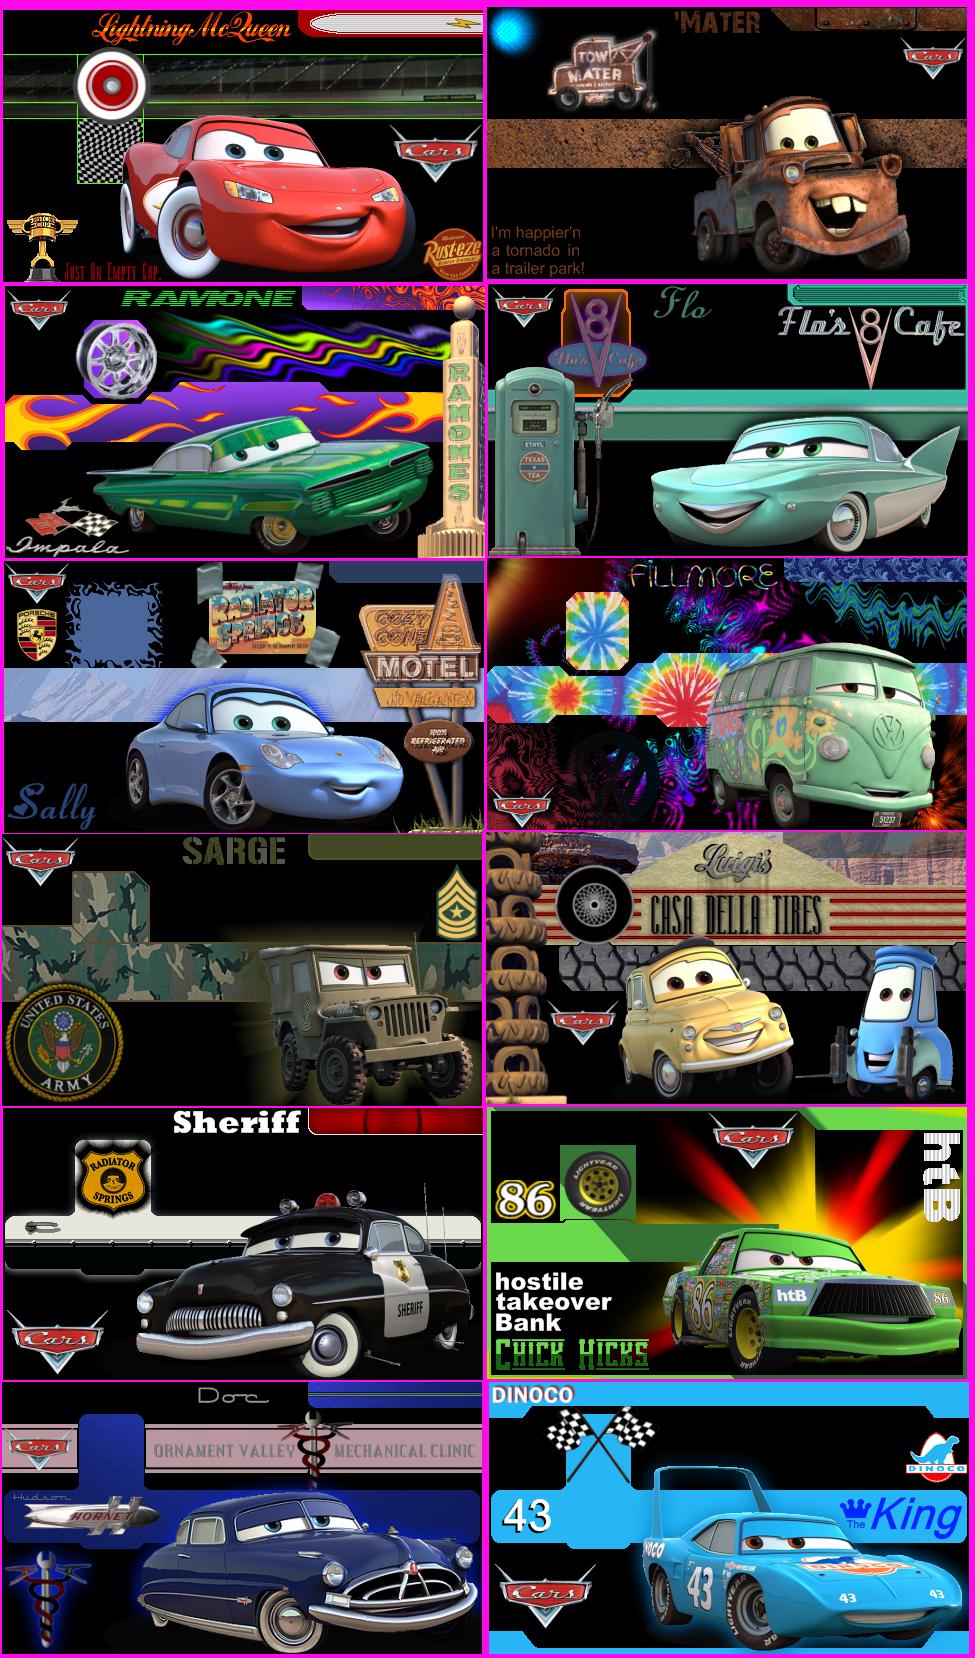 Disney-Pixar's Cars. by greendrakkon